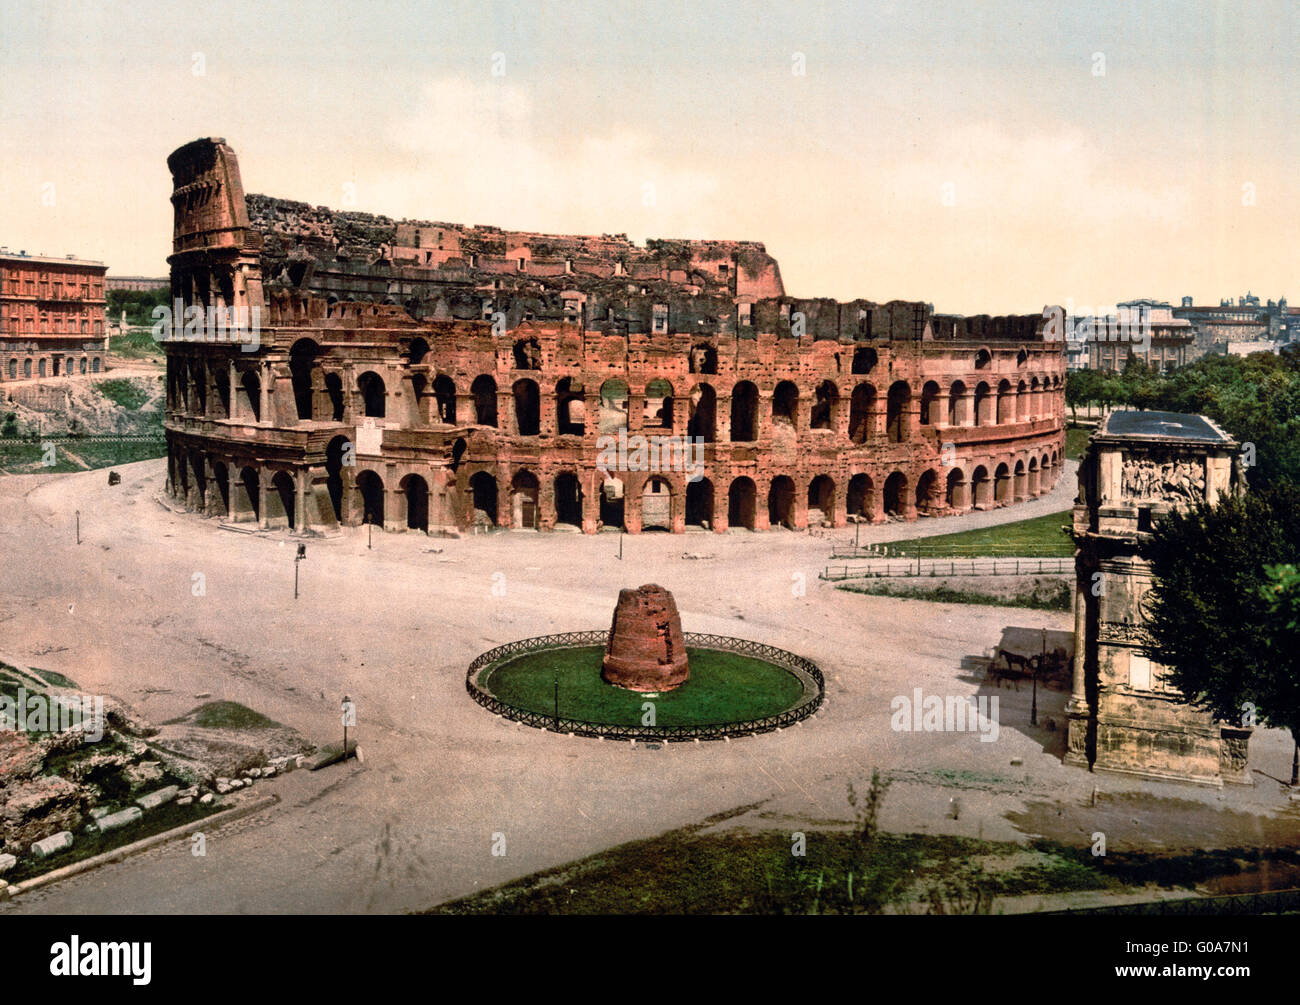 The Coliseum and Meta Sudans, Rome, Italy, circa 1900 - Stock Image